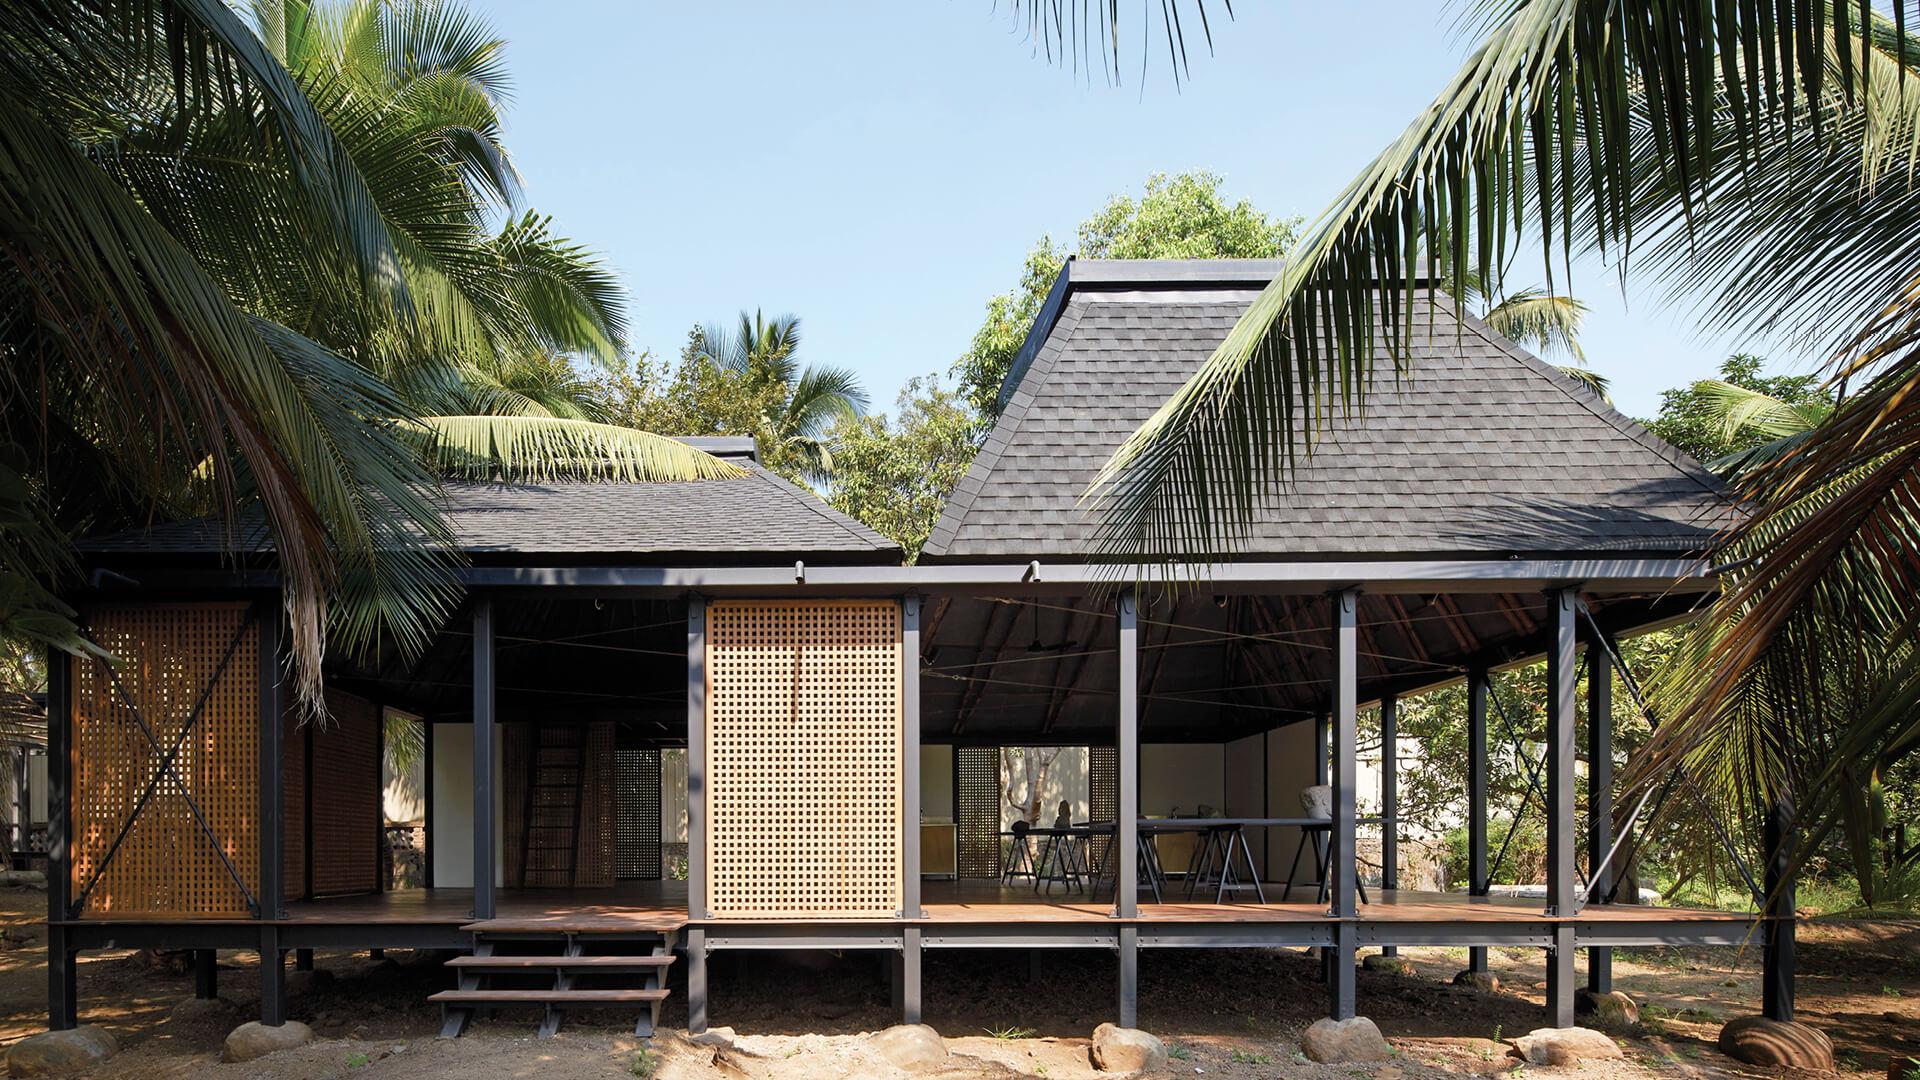 Architecture BRIO raises Mumbai Artist Retreat on stilts to survive flooding